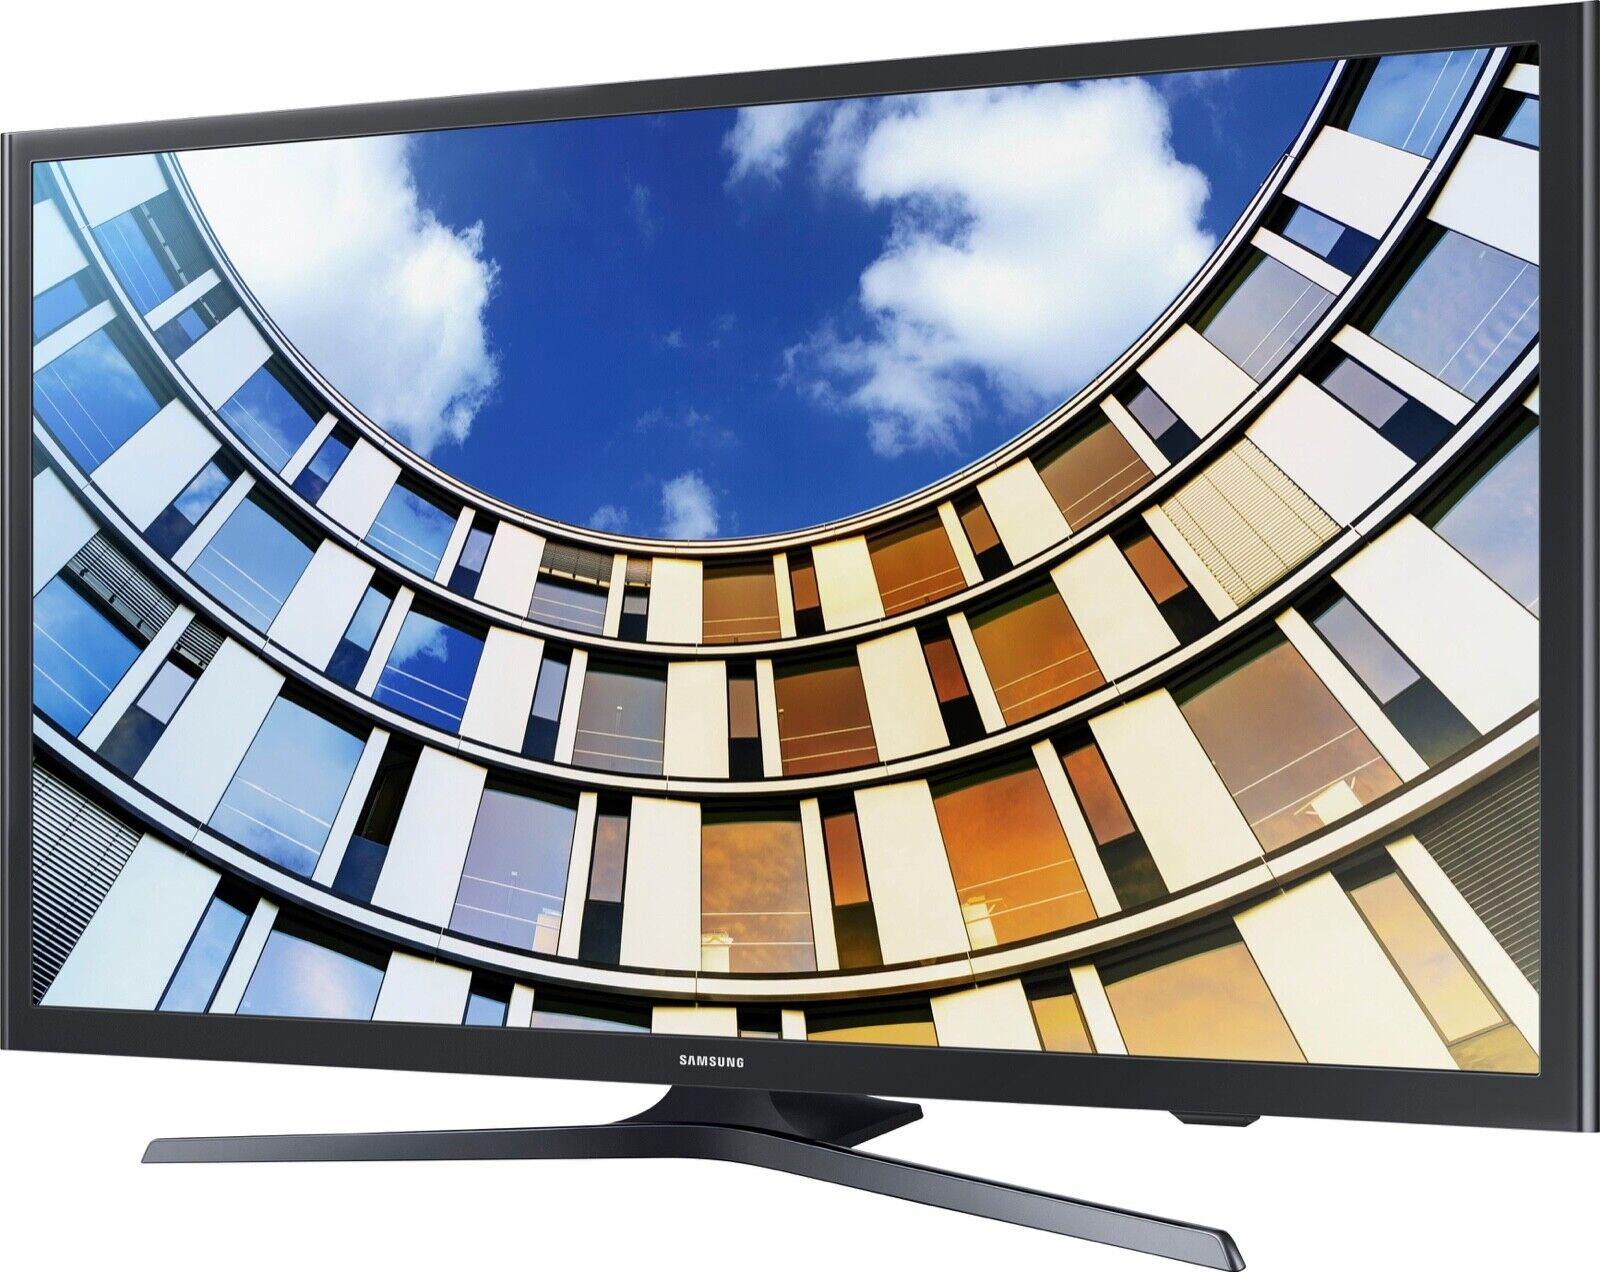 NEW Samsung Electronics UN40M5300A 40-Inch 1080p Smart LCD T